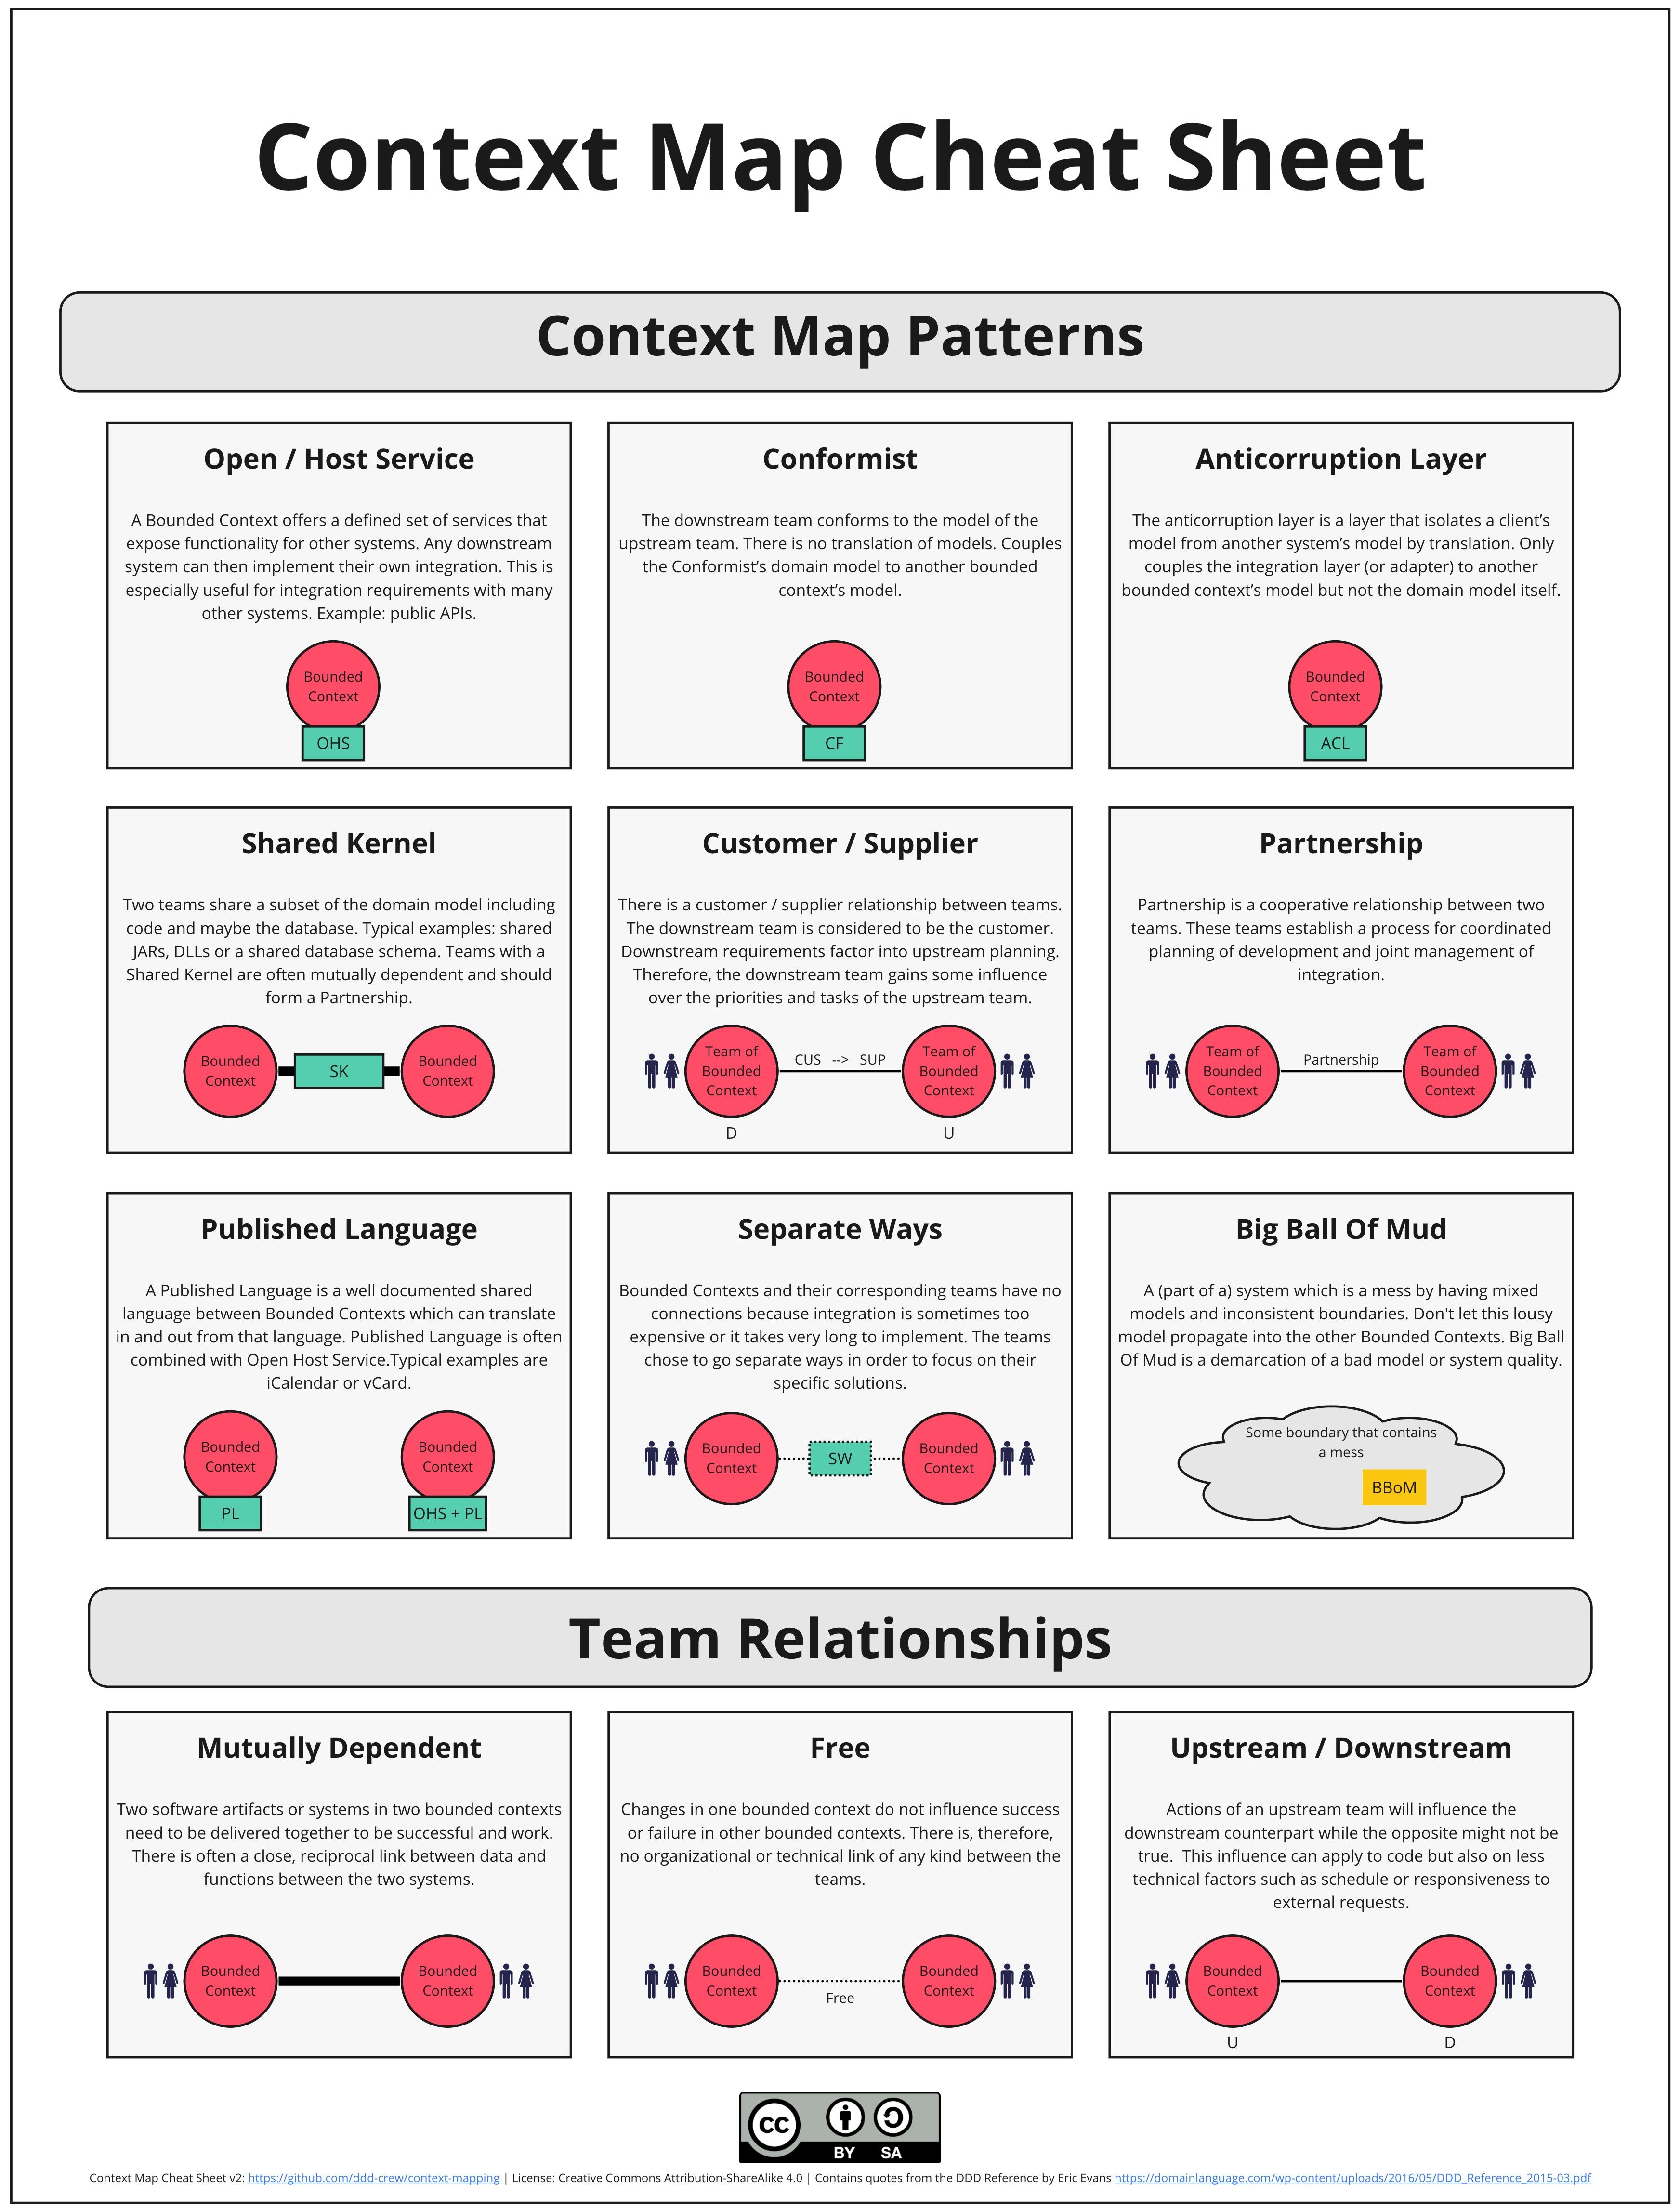 Context Map